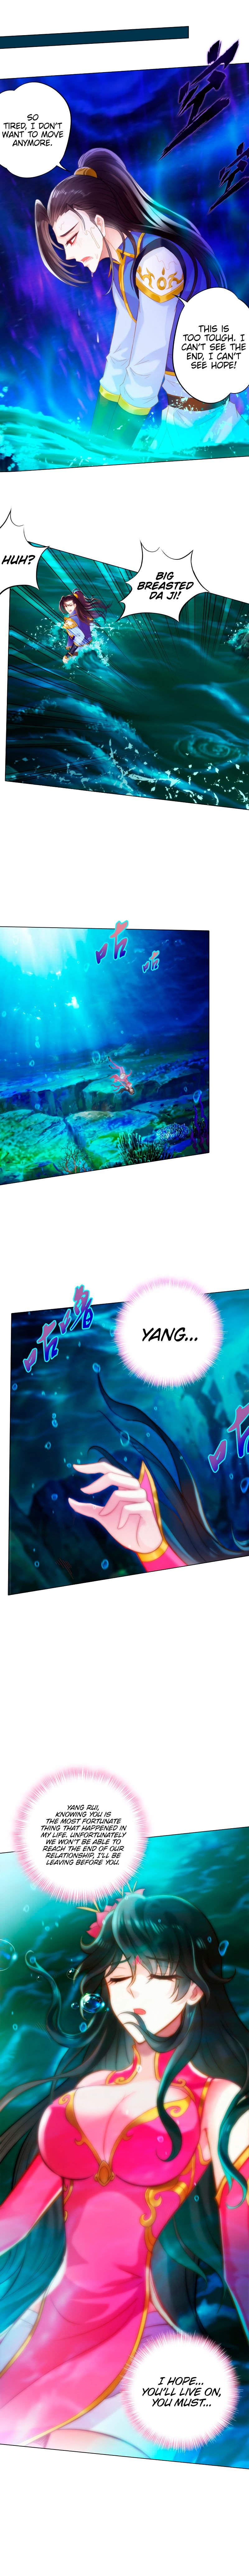 Manga Lang Huan Library - Chapter 78 Page 7